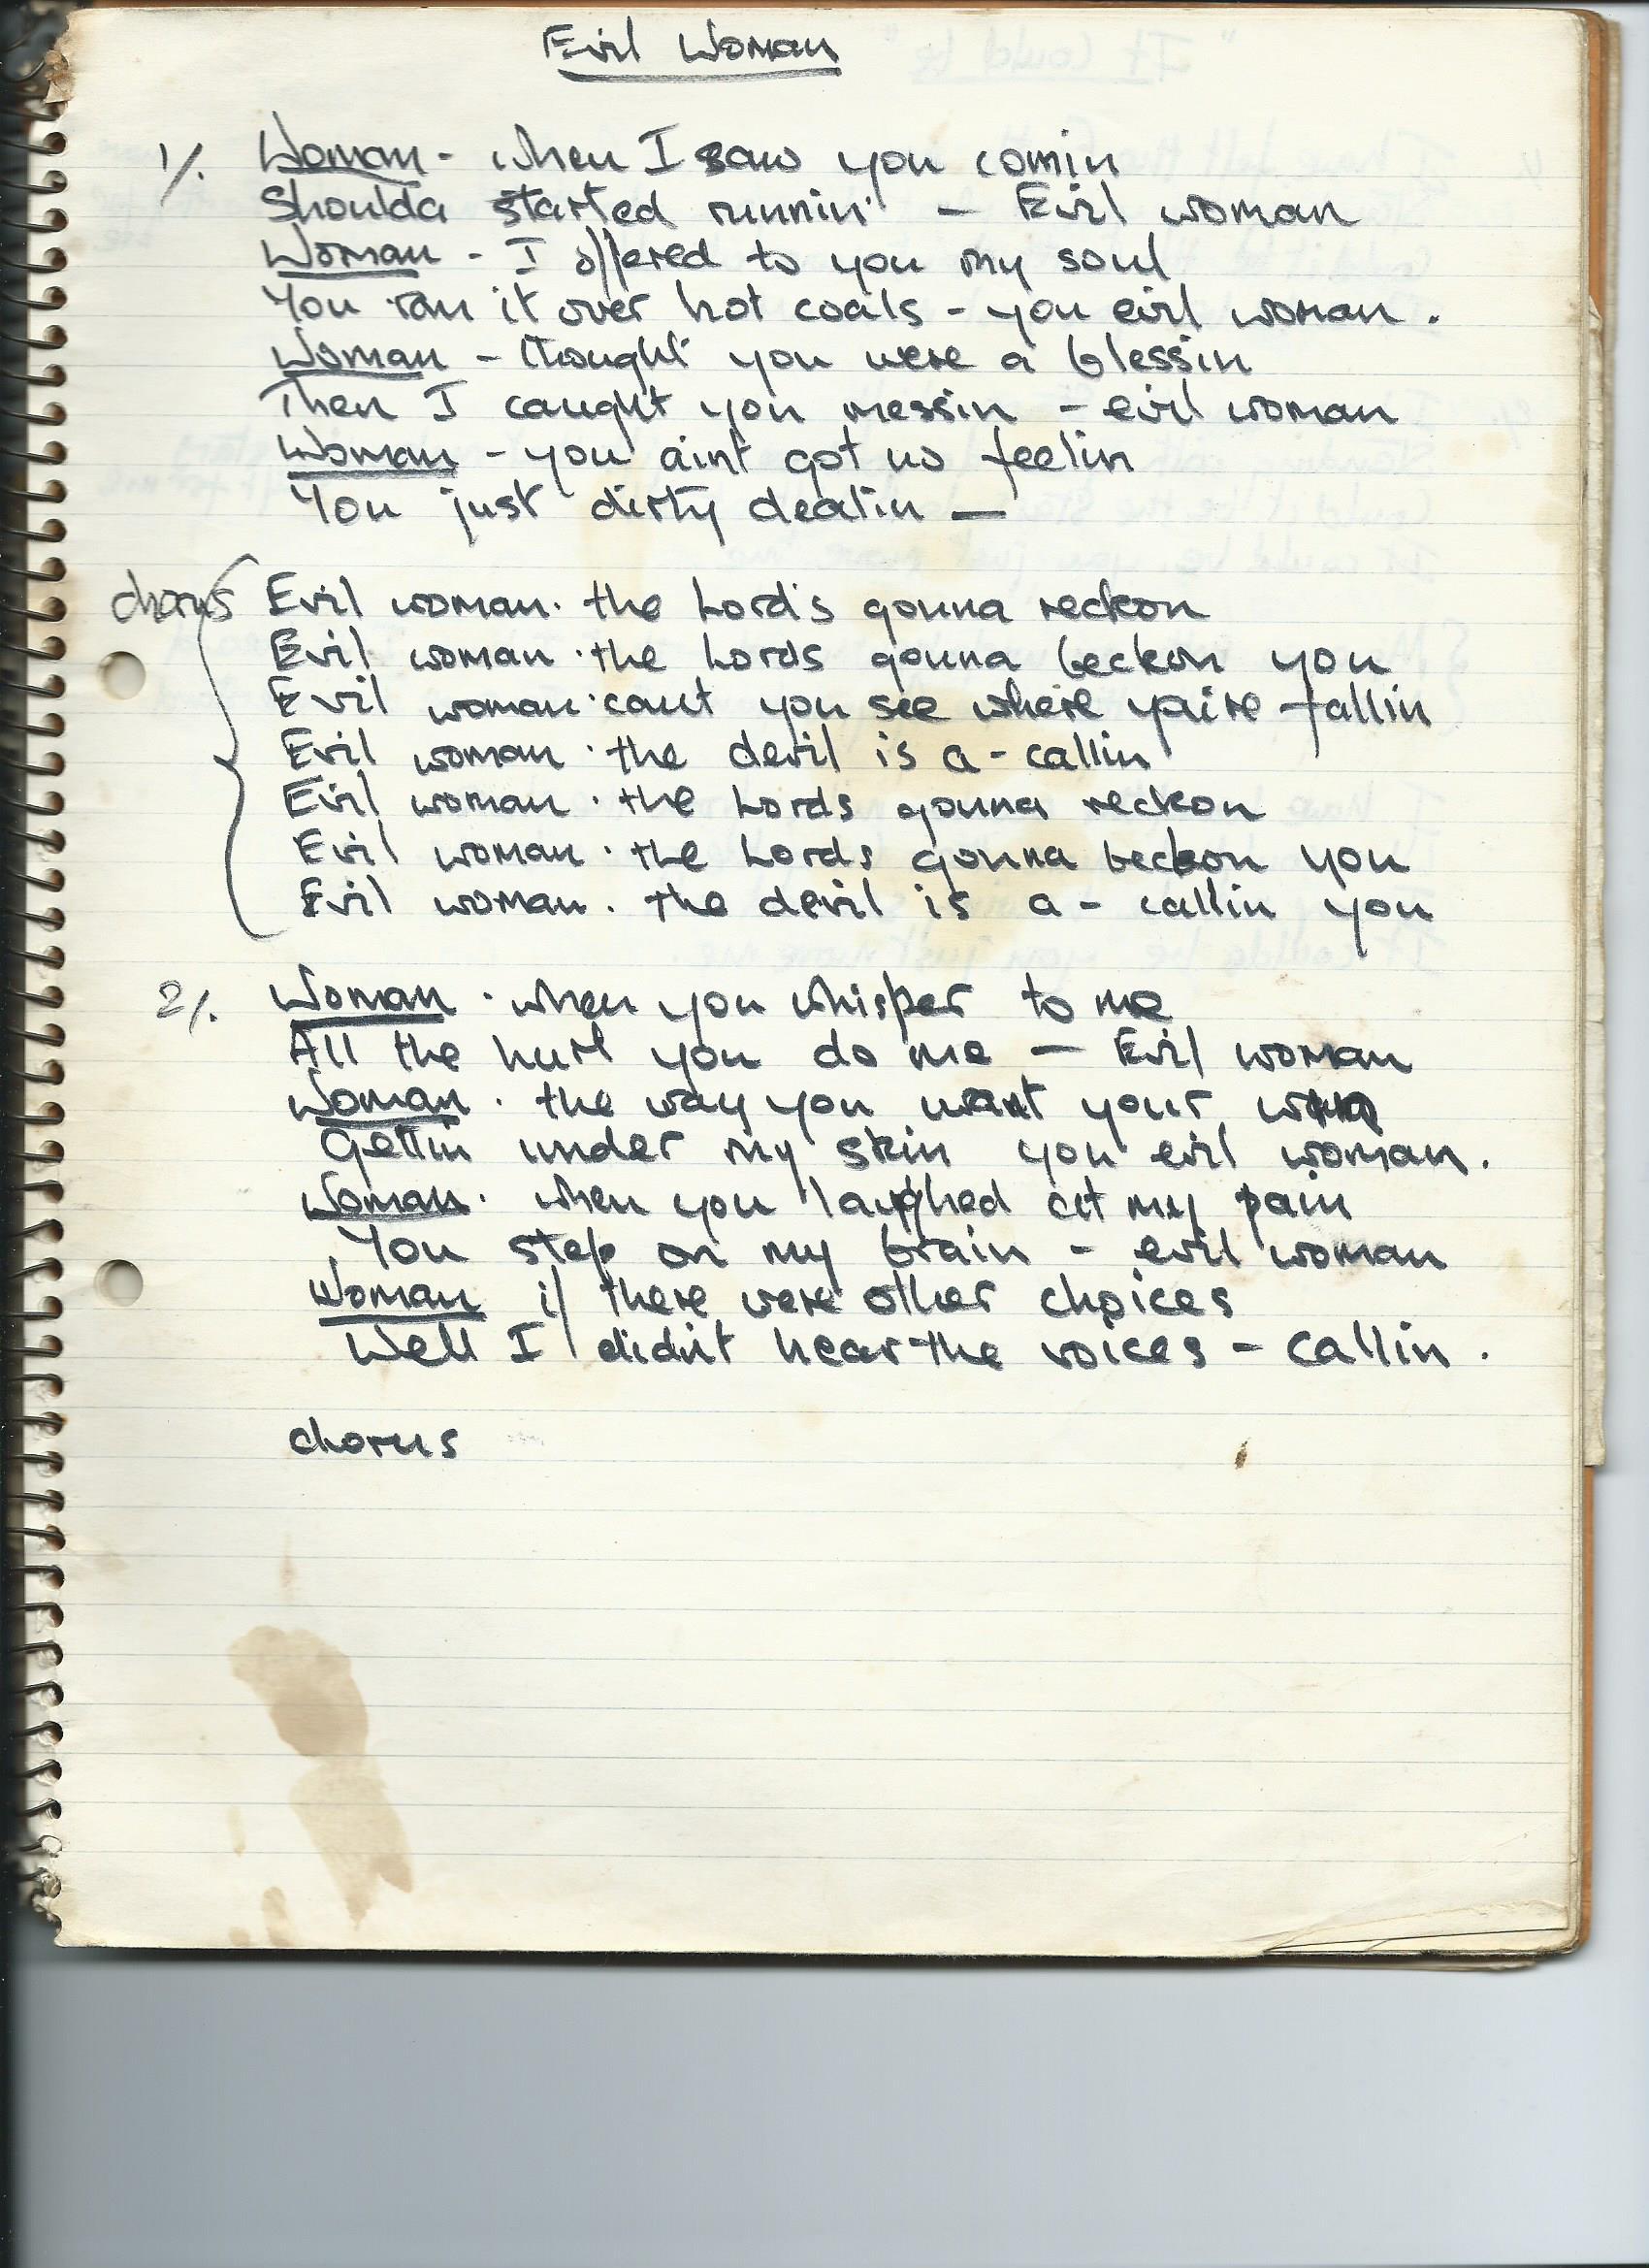 Jackie Lomax Lyrics Archive